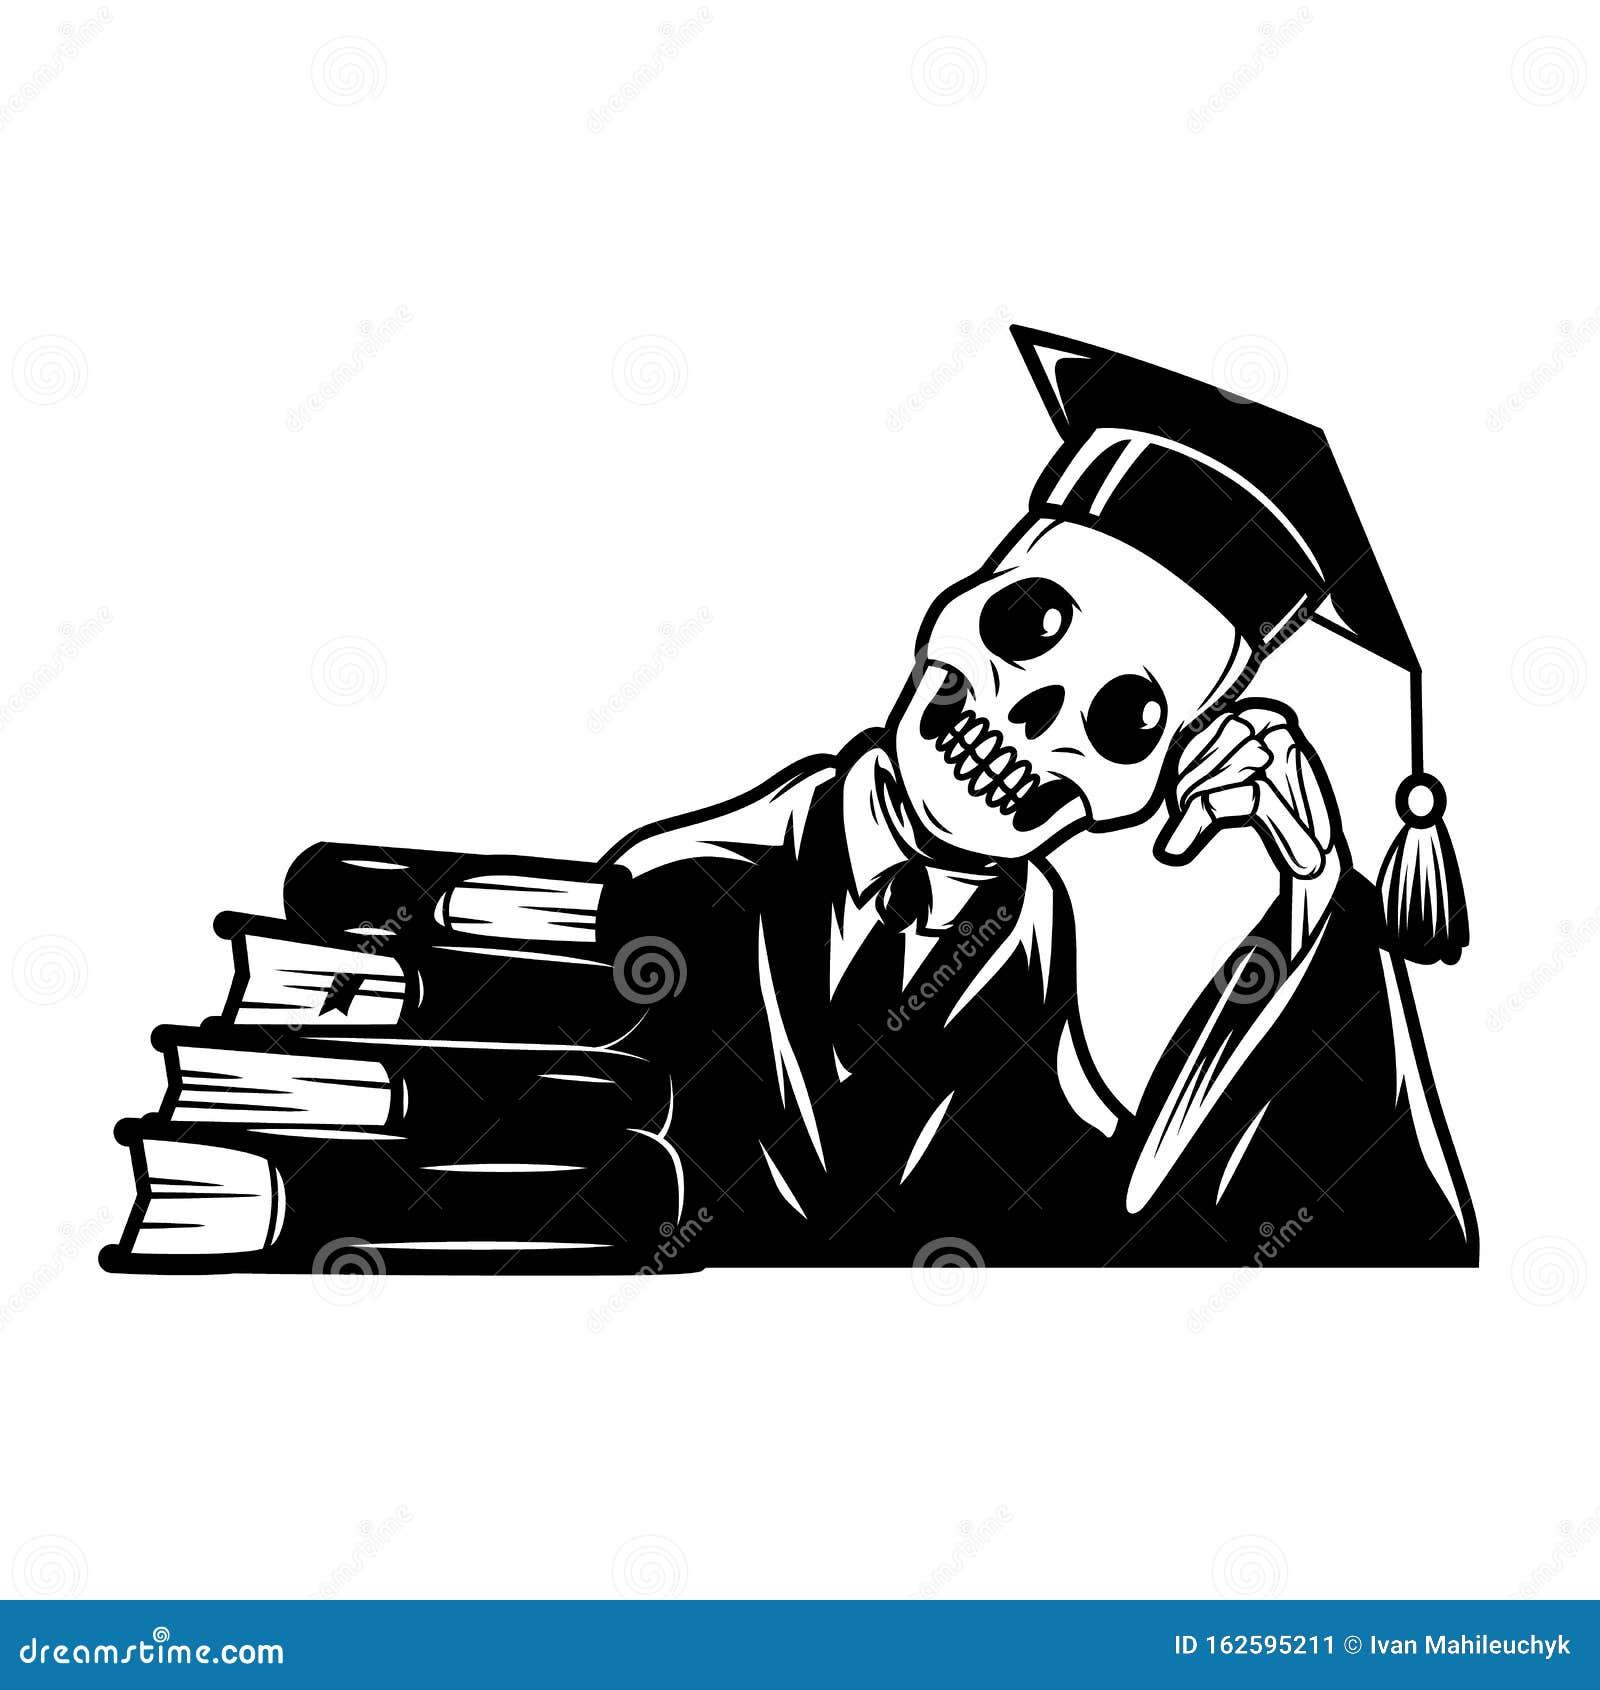 Skeleton Graduation Stock Illustrations – 50 Skeleton Graduation Stock  Illustrations, Vectors & Clipart - Dreamstime